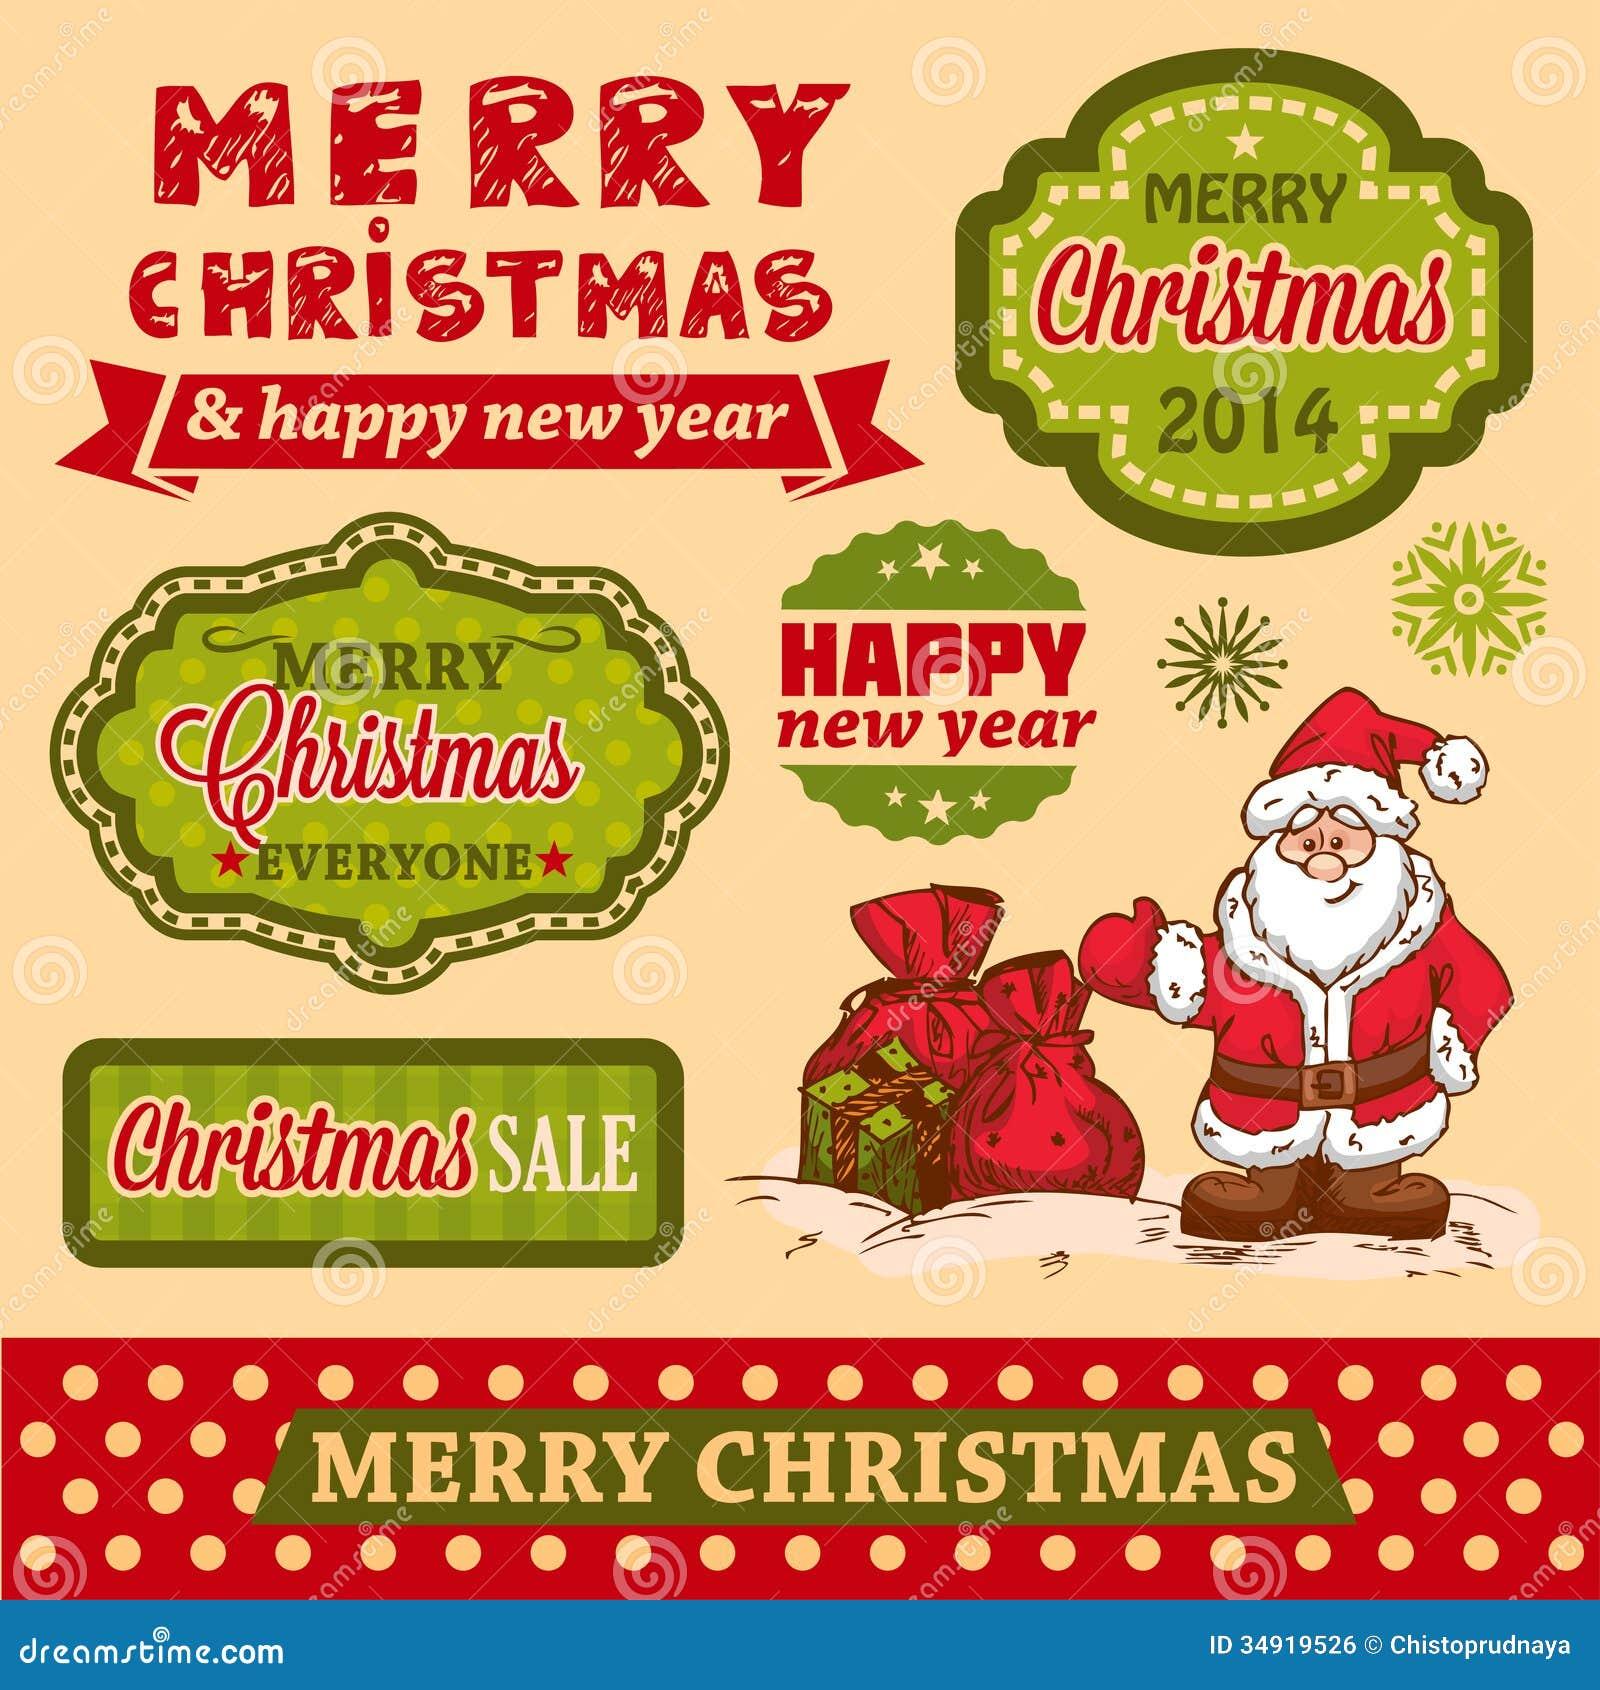 christmas design elements royalty free stock image - image: 34919526